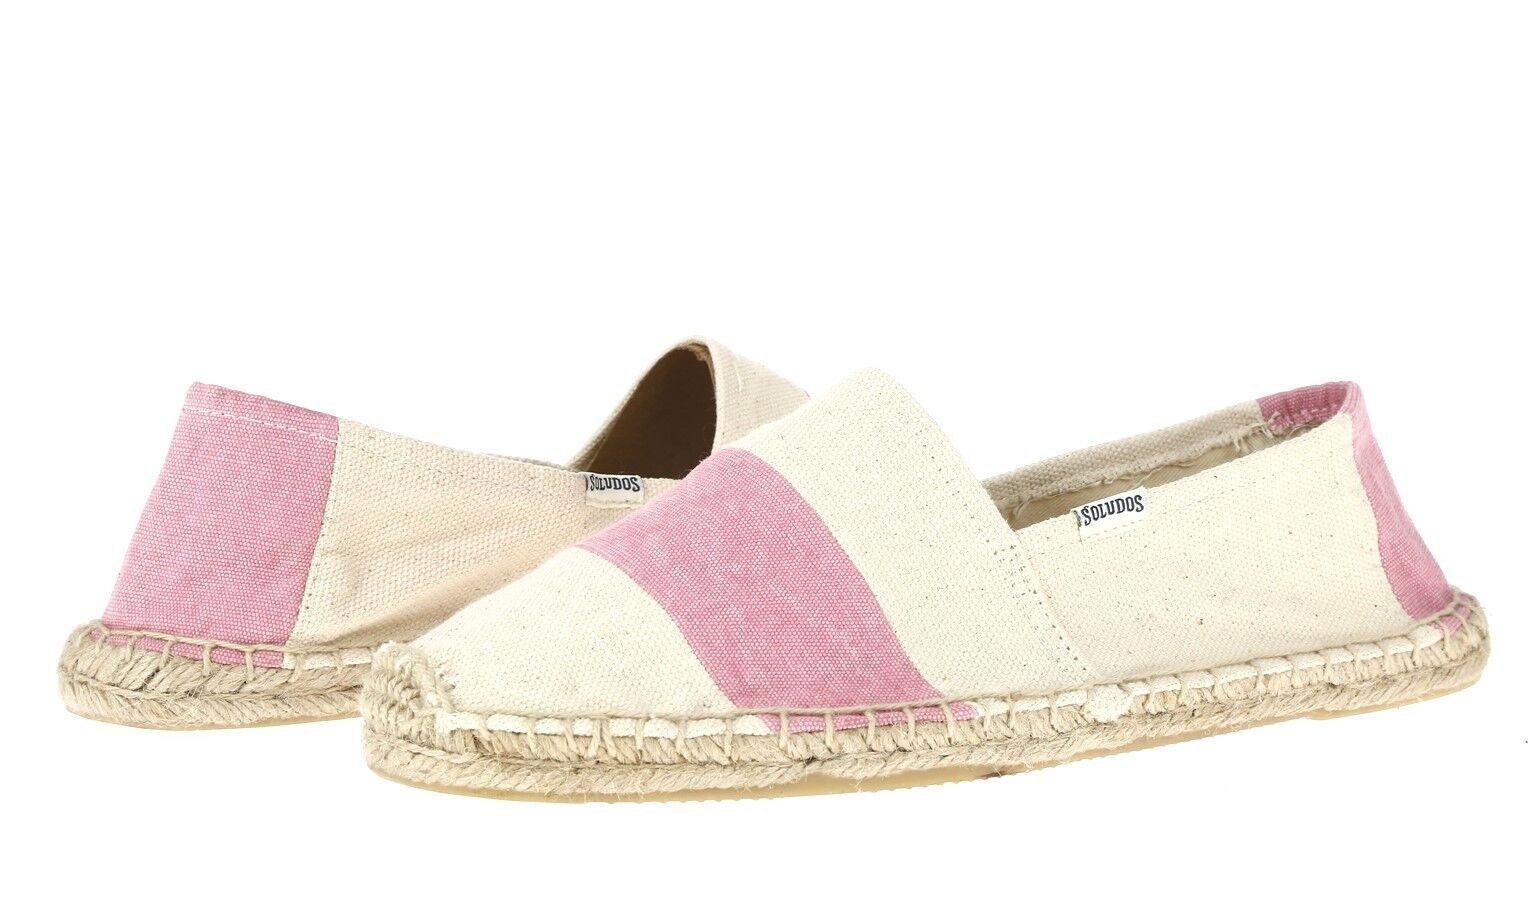 Damenschuhe SOLUDOS 225636 ivory / pink canvas espadrilles schuhe sz. 10